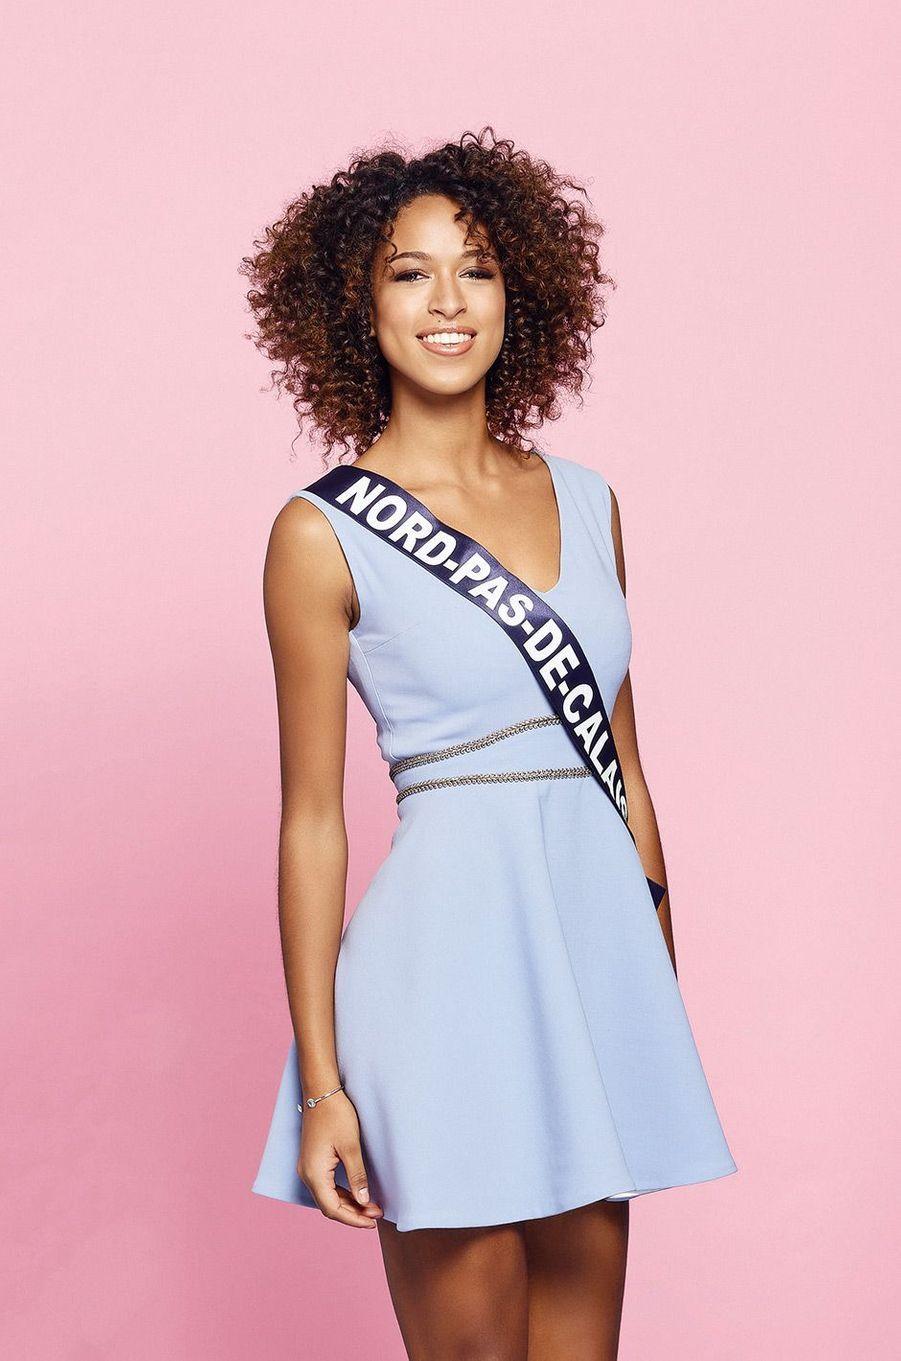 Miss Nord-Pas-de-Calais: Annabelle Varane